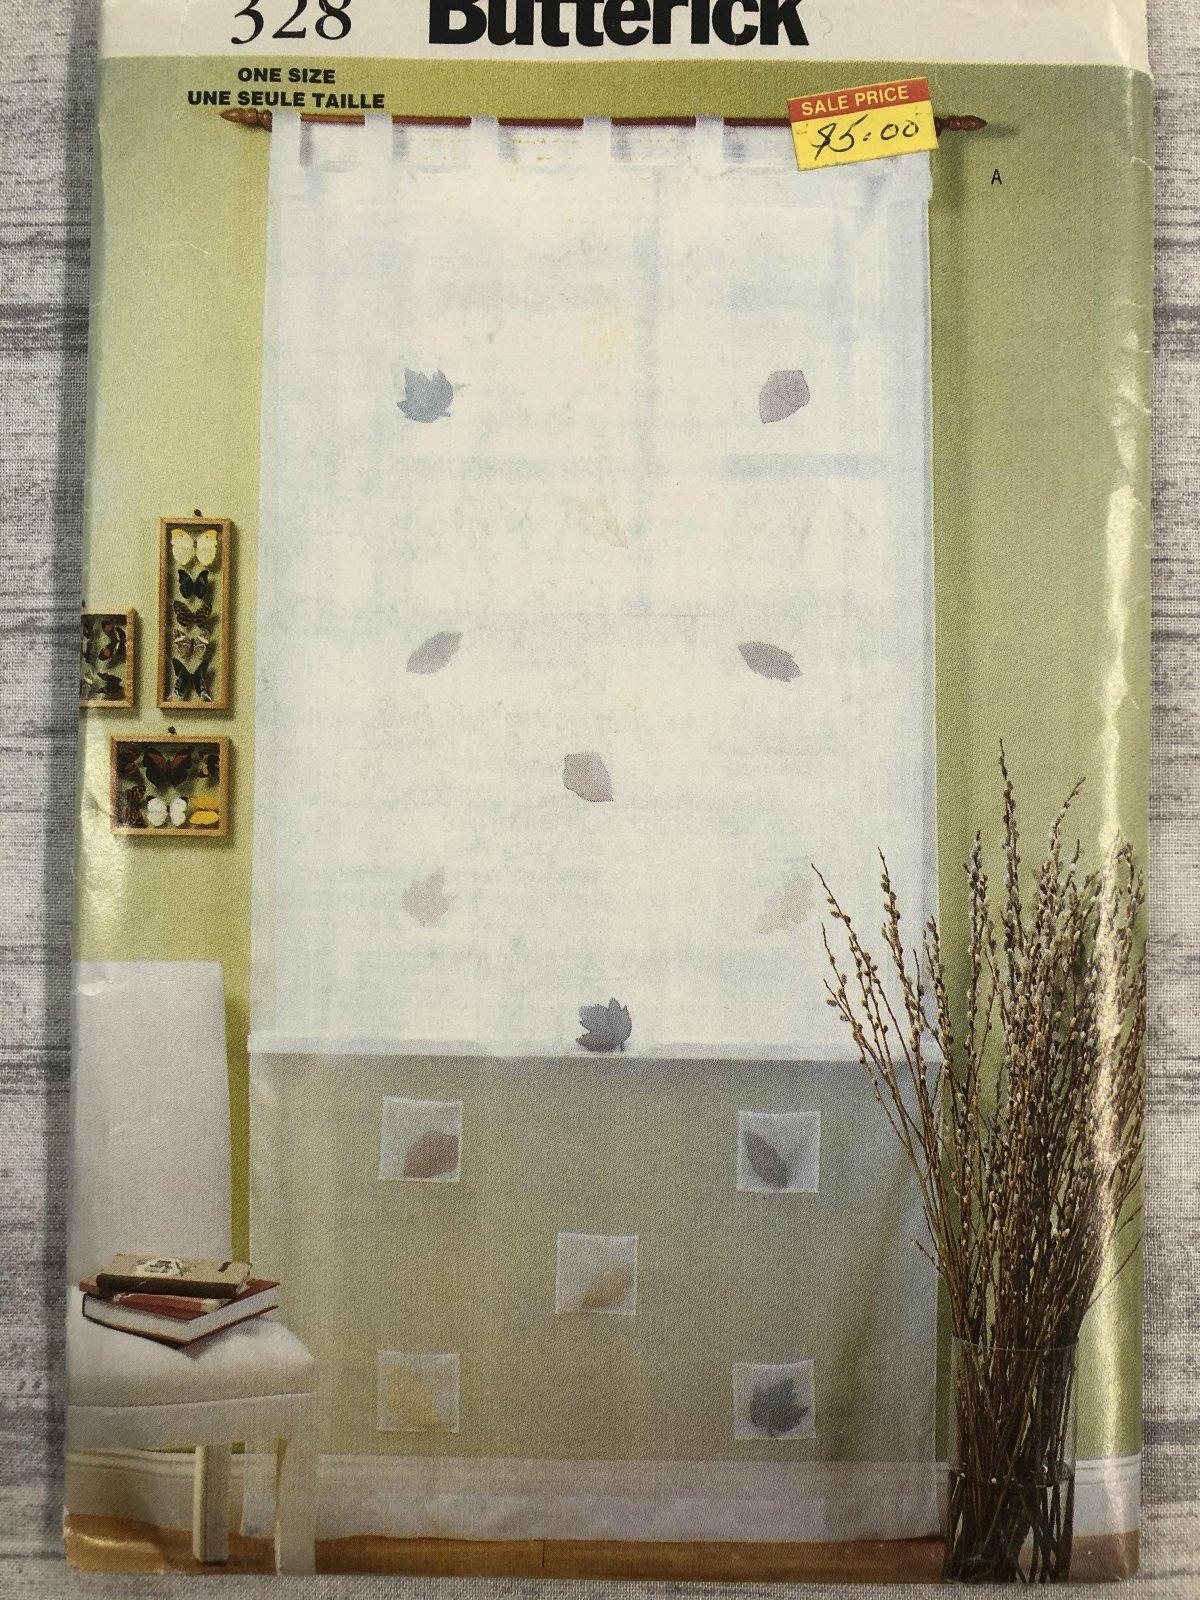 Butterick Waverly Window - Tab Top Pocket Curtain 0328